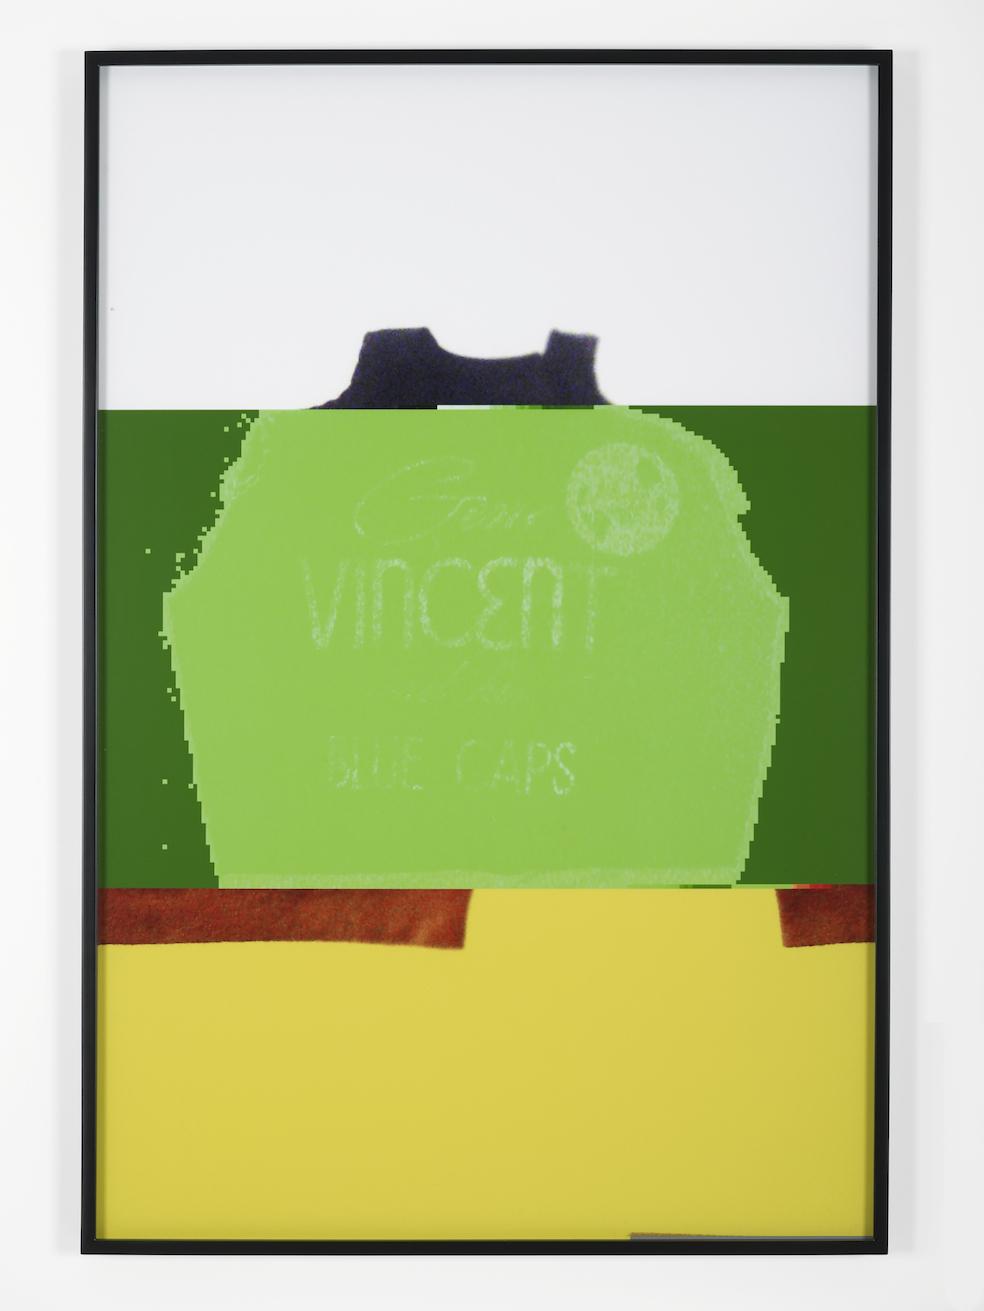 Freckled Lemonade 2014 Archival Pigment Print 106.6 x 71.1 cm / 42 x 28 in Unique